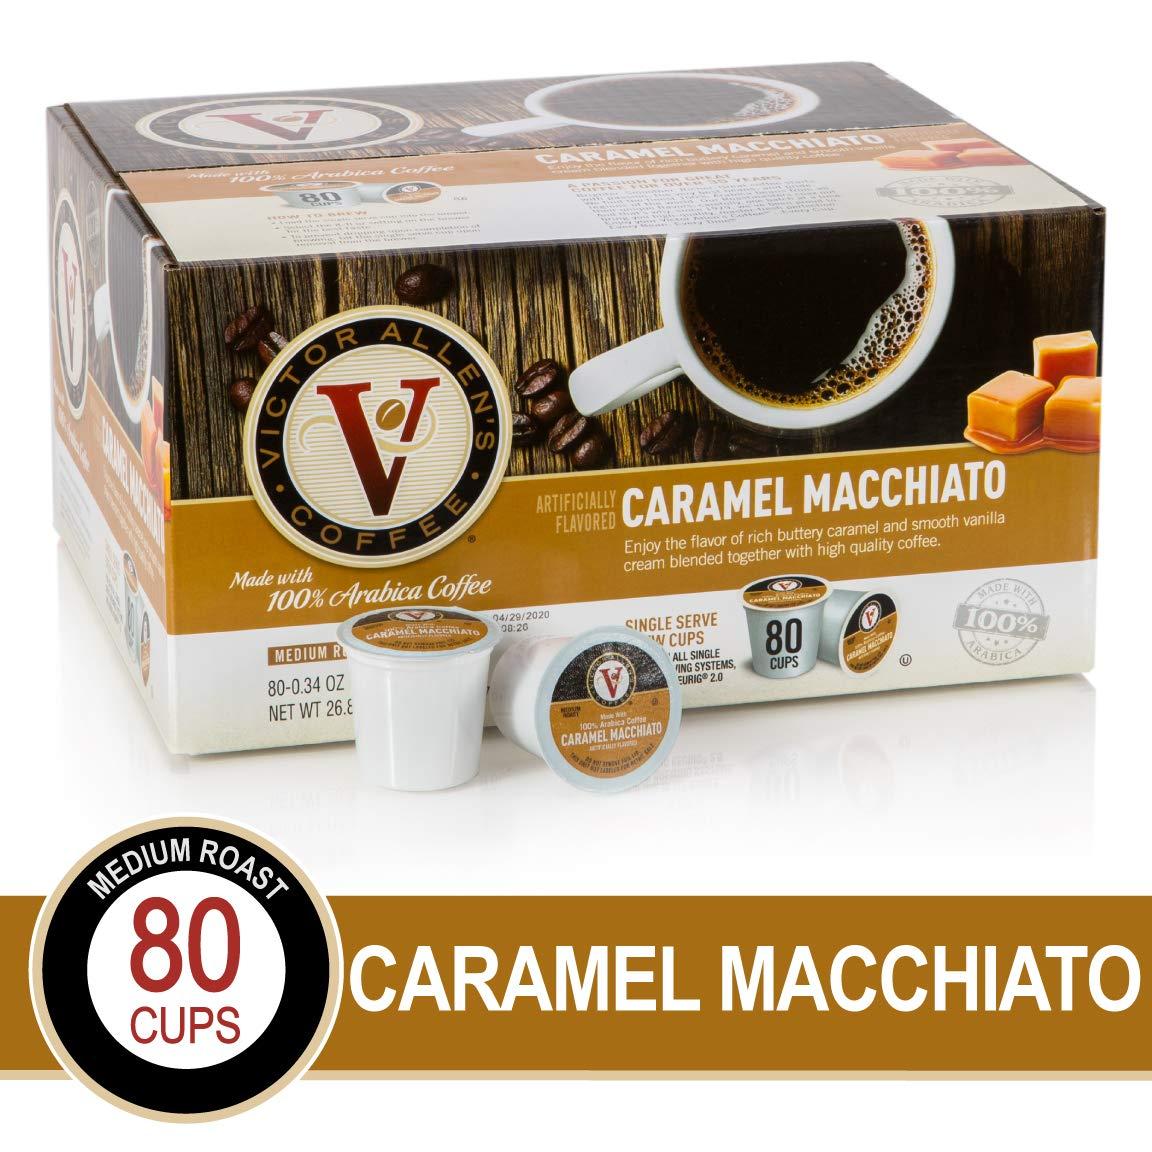 Caramel Macchiato for K-Cup Keurig 2.0 Brewers, 80 Count, Victor Allen's Coffee Medium Roast Single Serve Coffee Pods